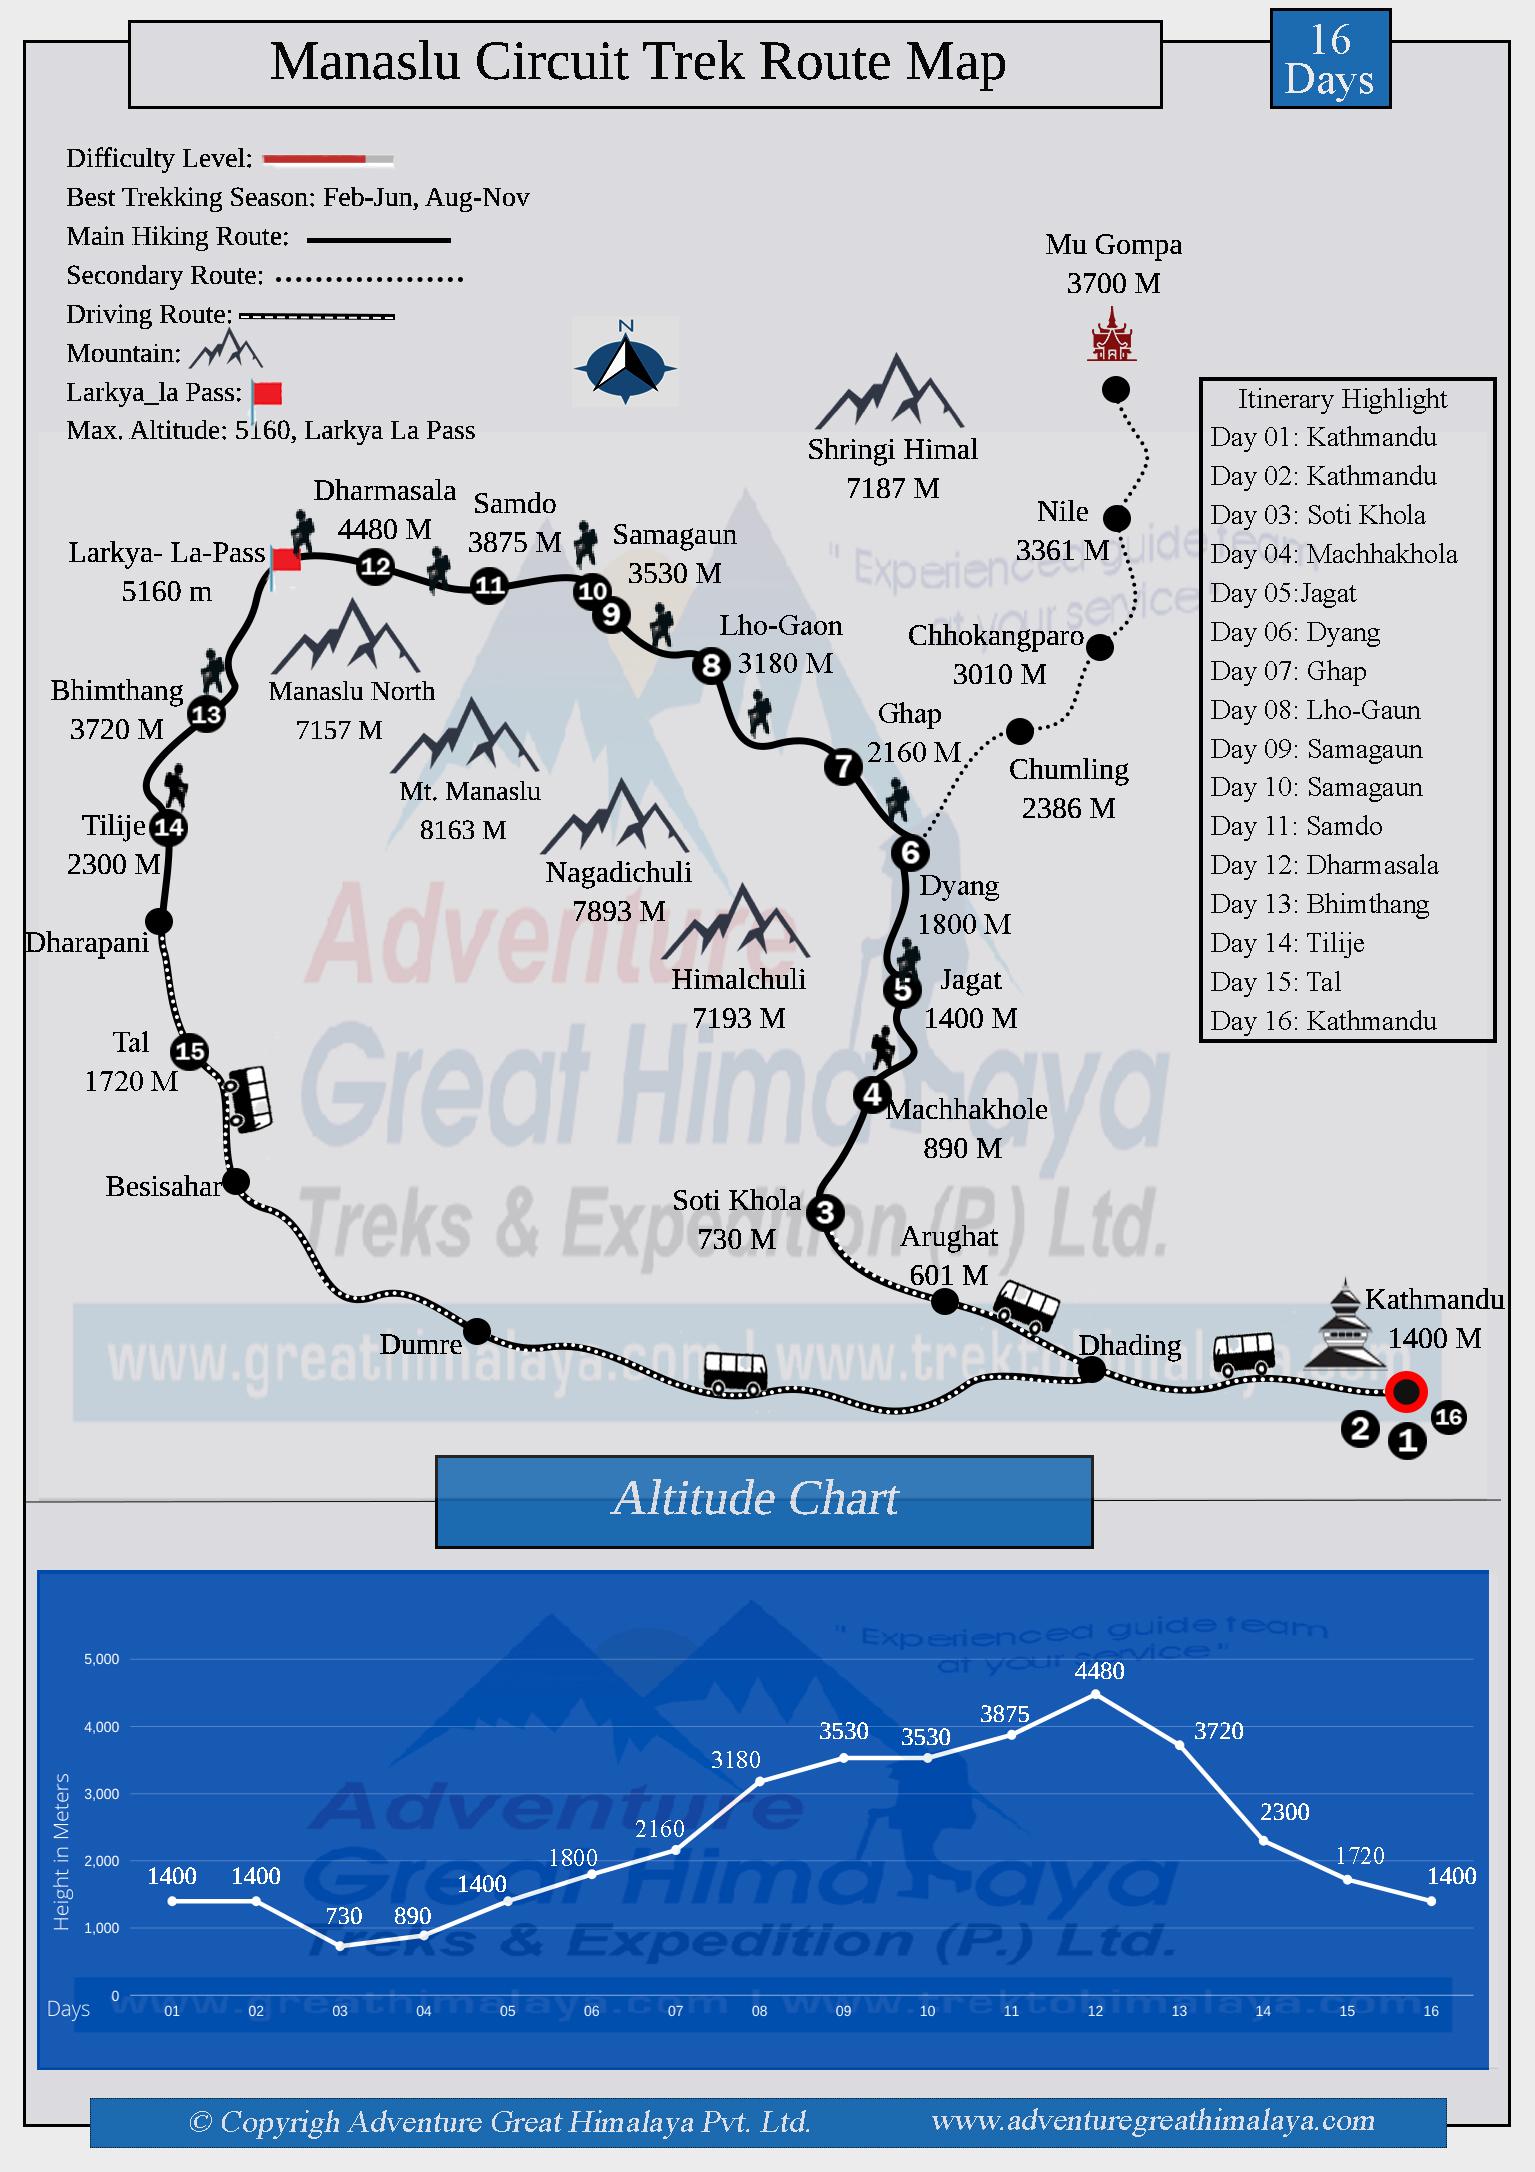 Manaslu Circuit Trek Route Map